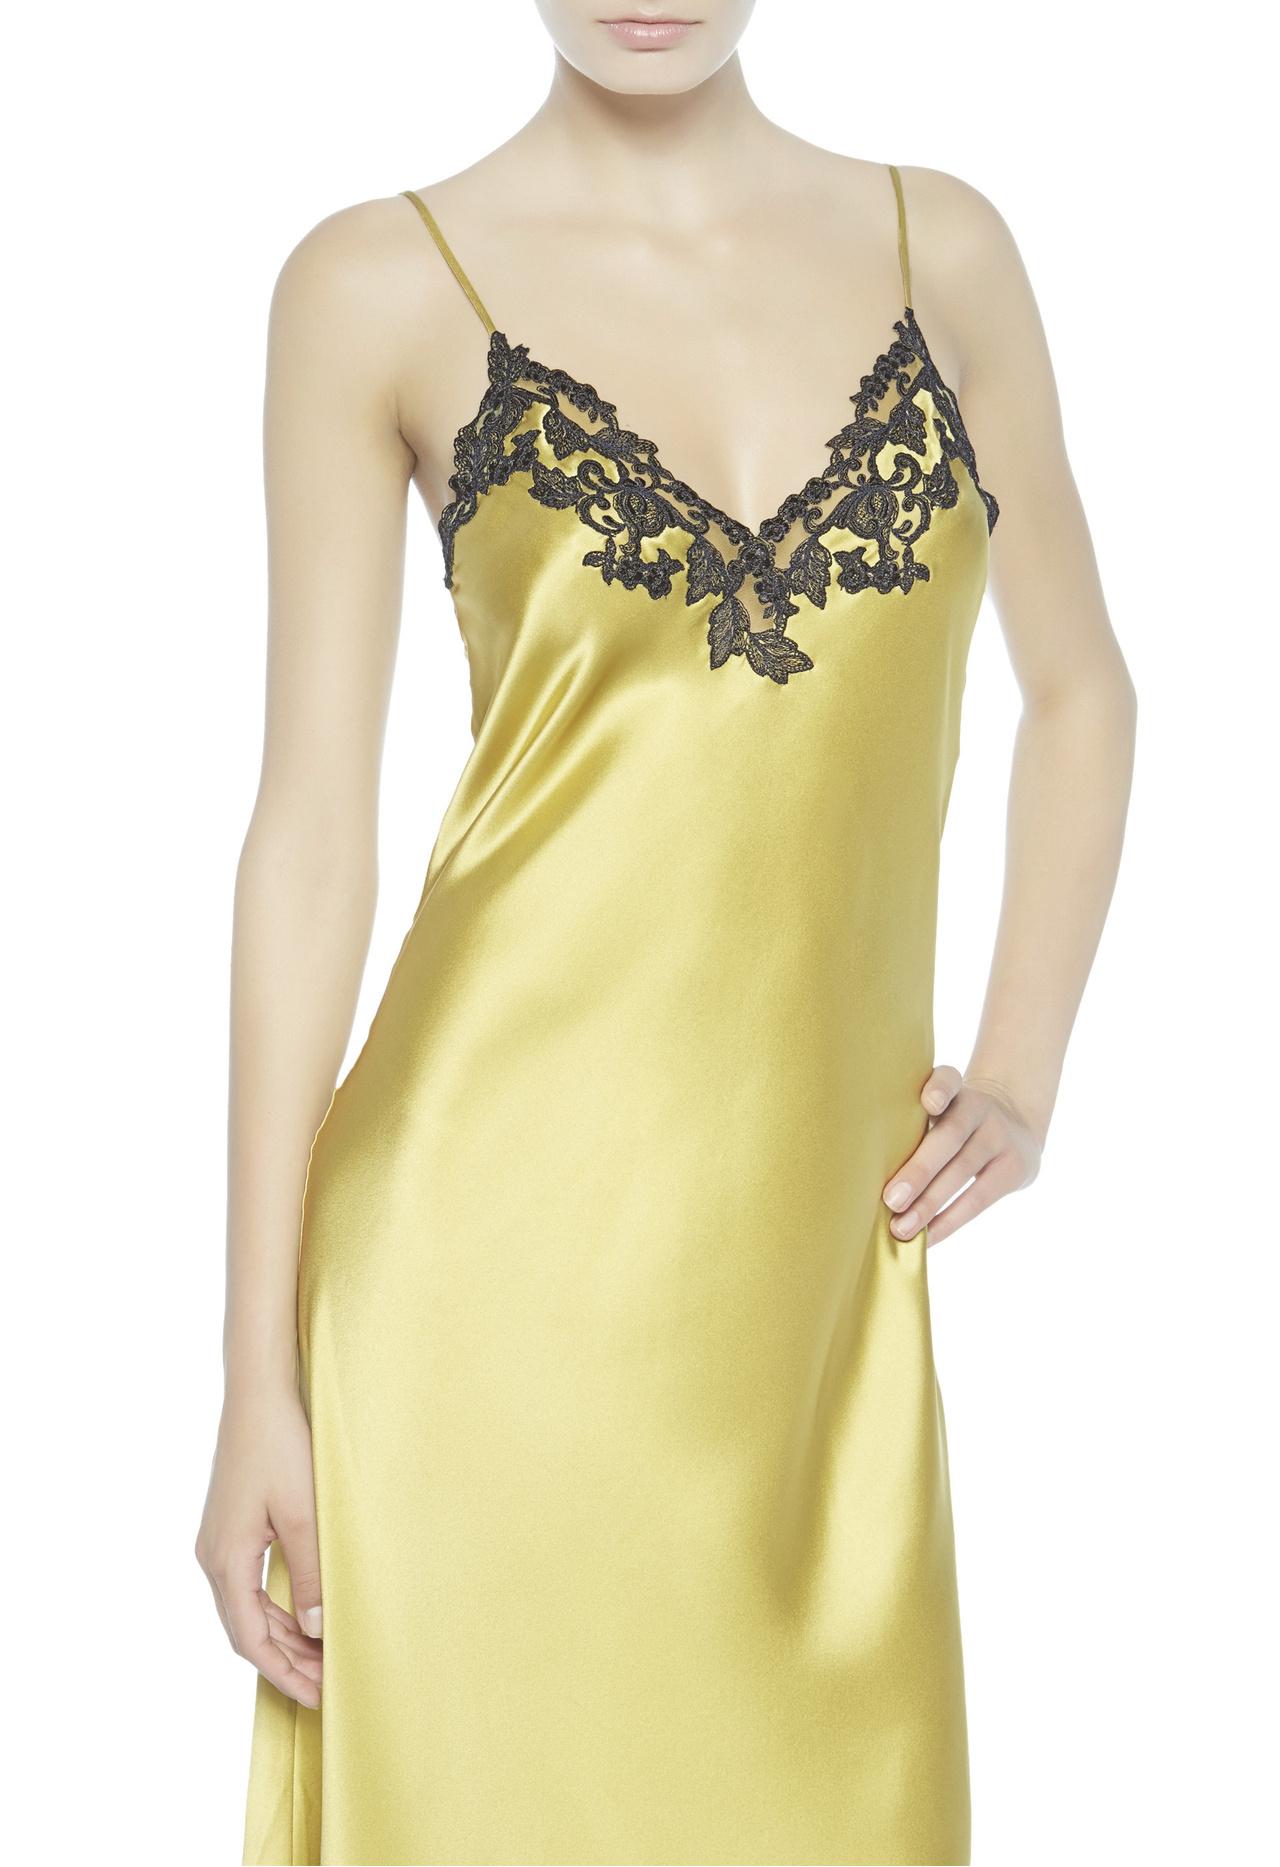 Lyst la perla maison nightgown in yellow for Lca maison